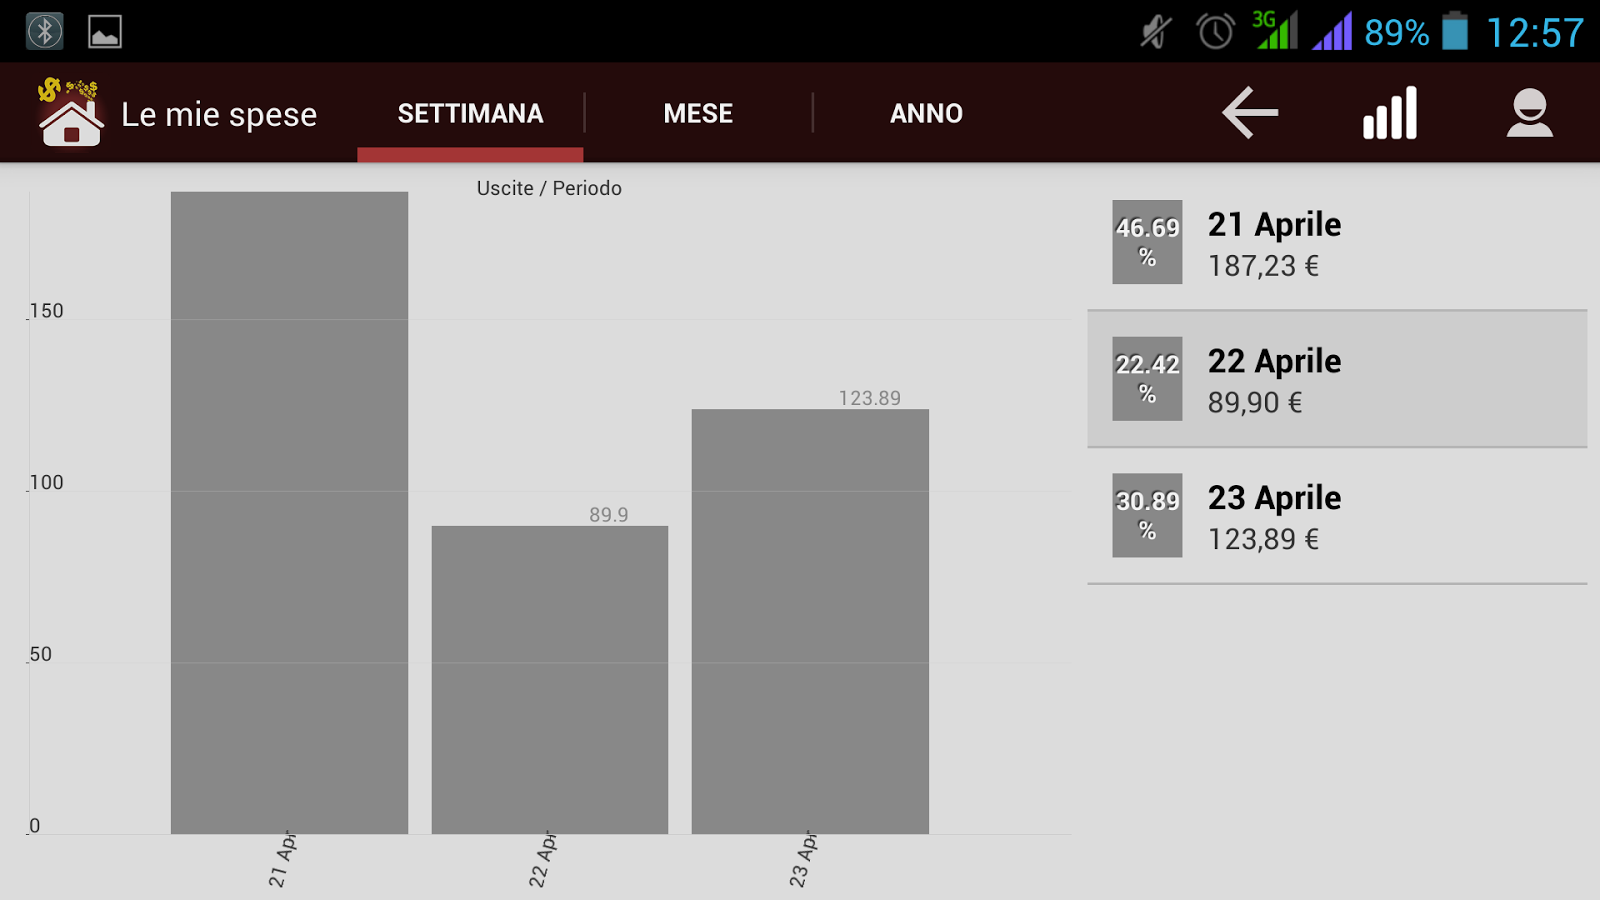 Spese familiari gestione spese app android su google play - Spese familiari ...